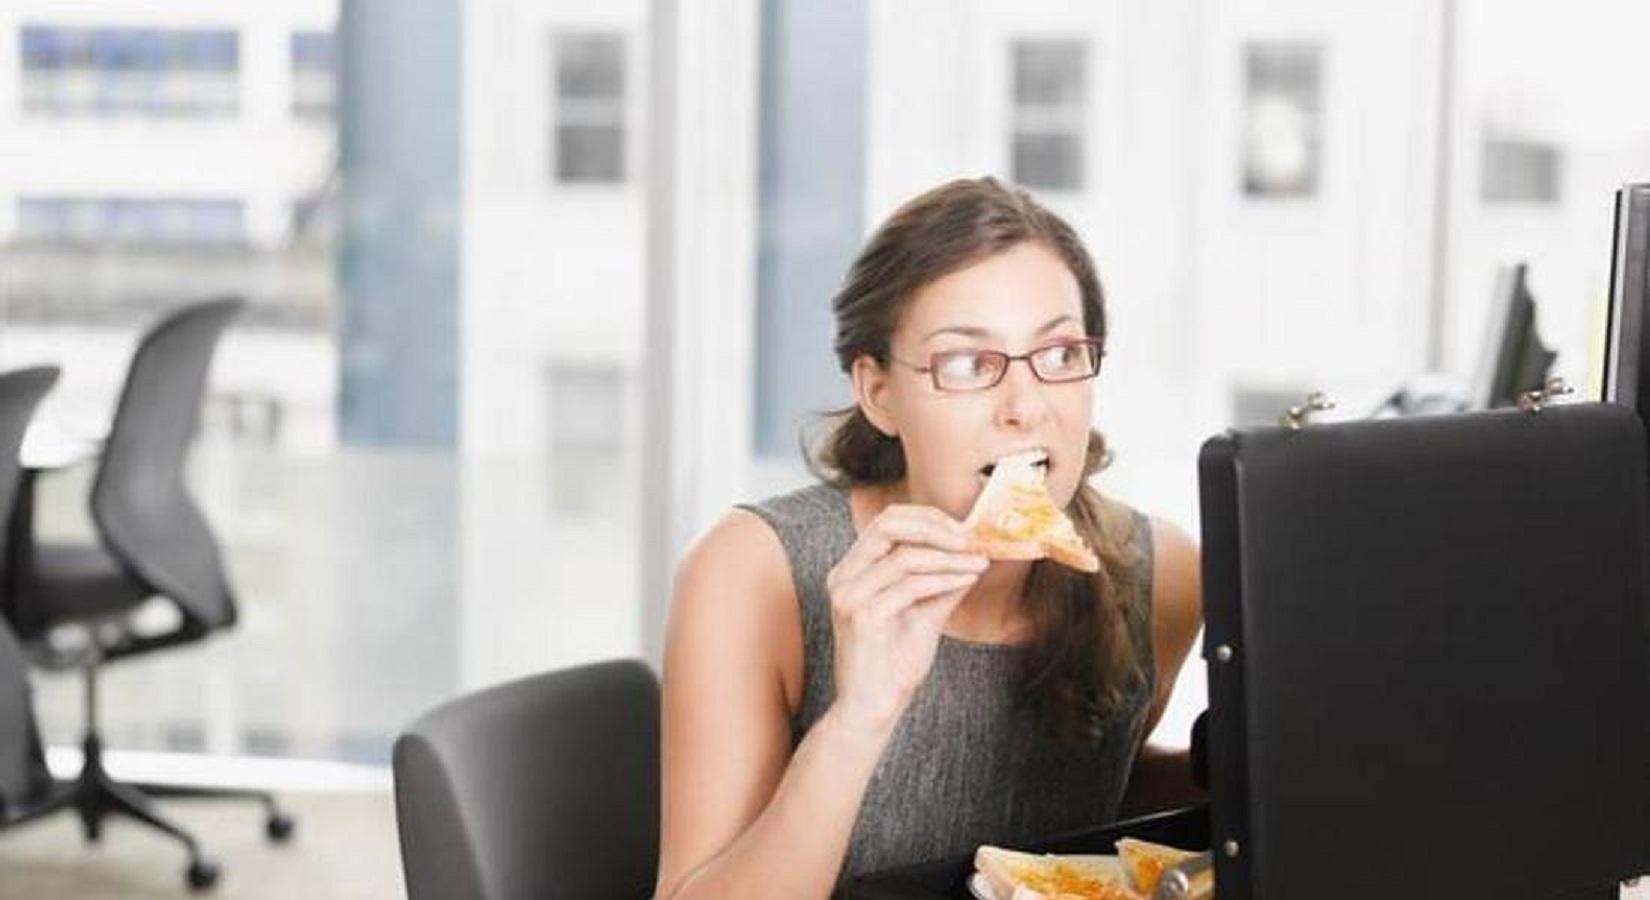 Dimagrire, 12 consigli per una dieta sana